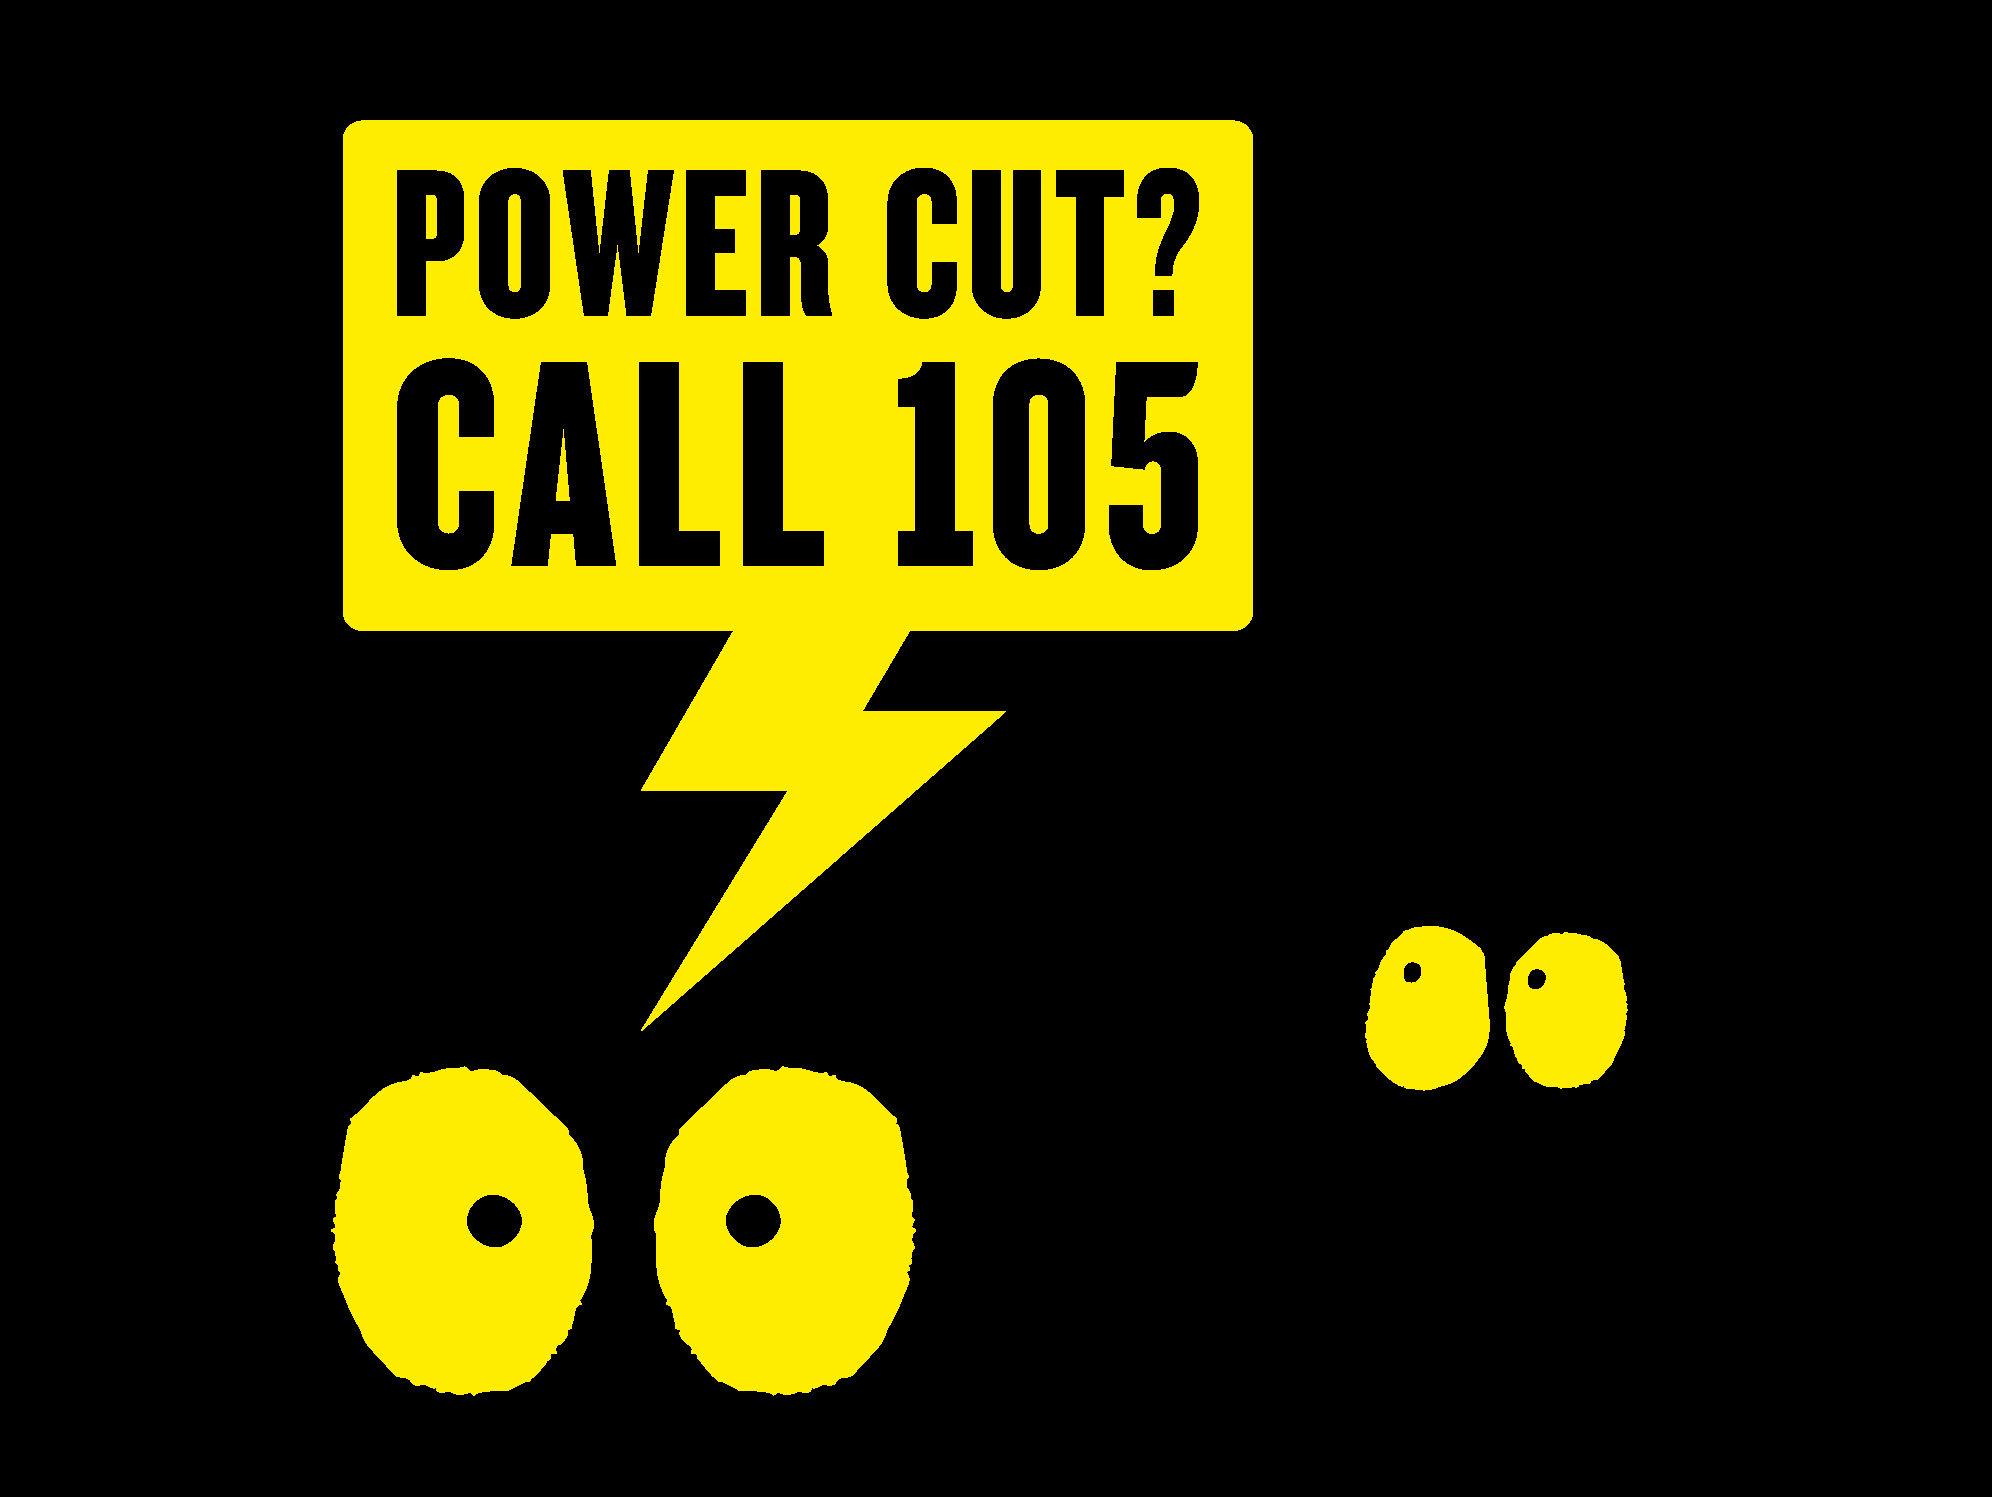 Call 105